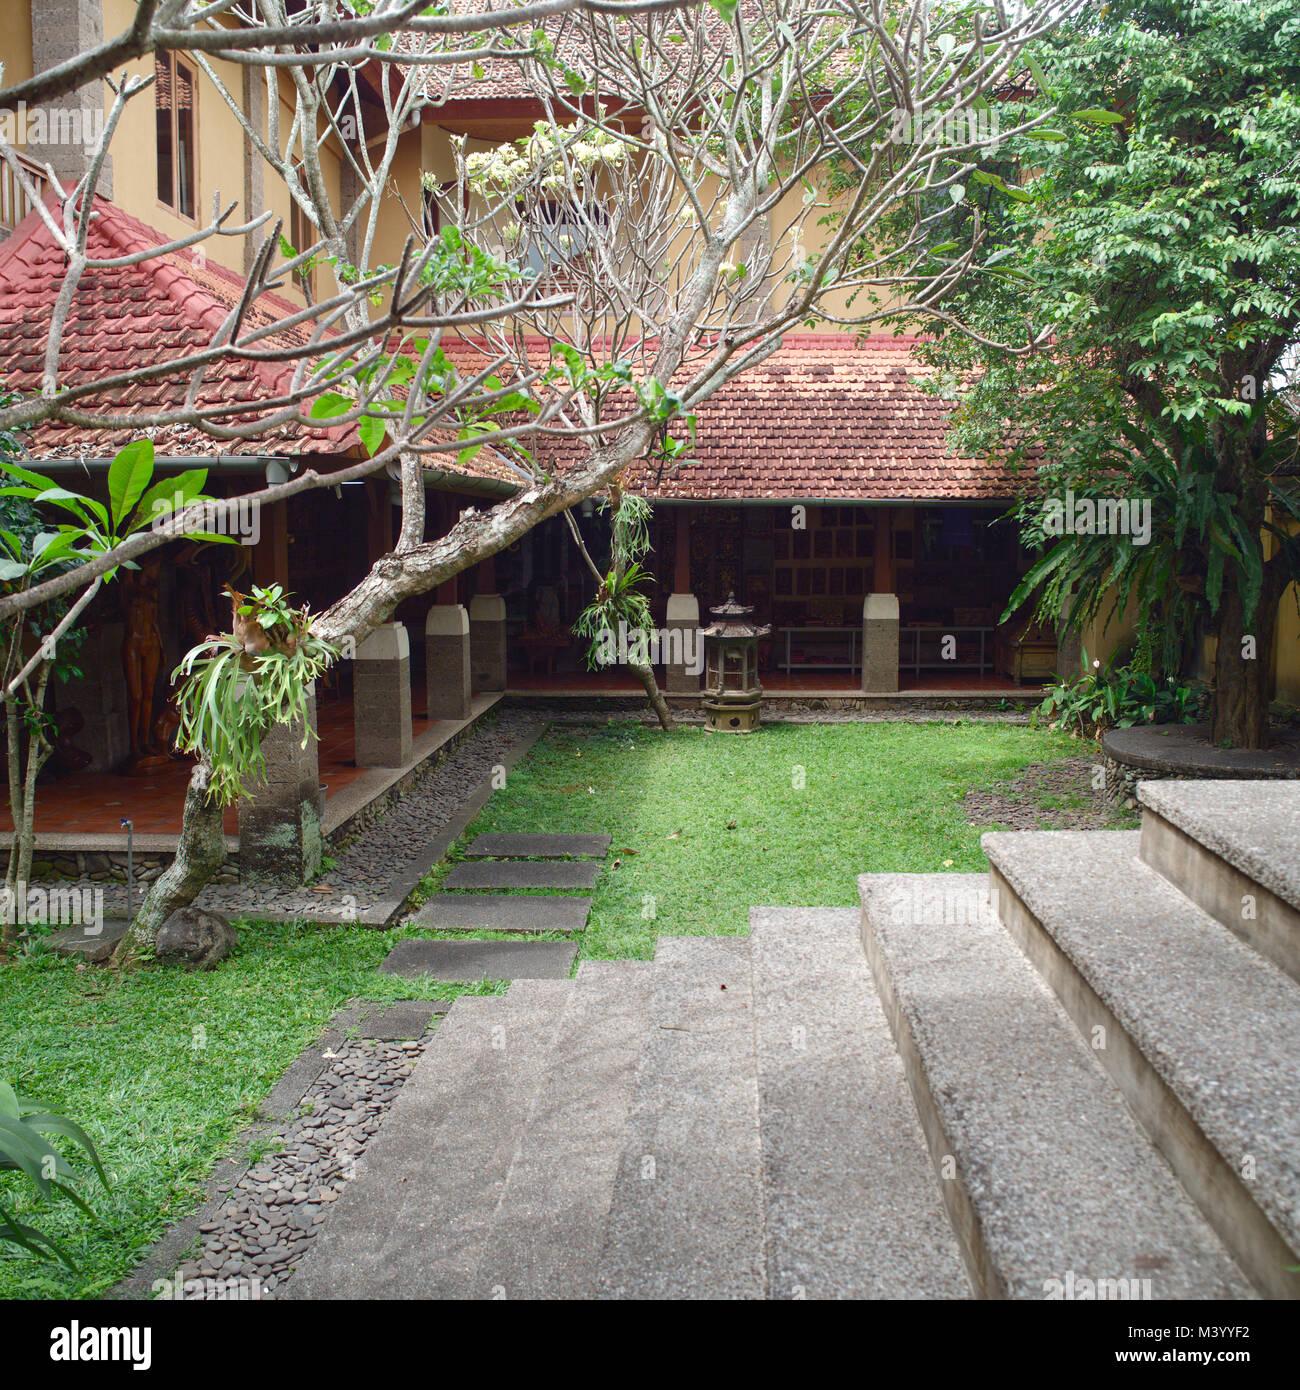 Balinese Backyard Designs balinese backyard, gardening design stock photo: 174561942 - alamy